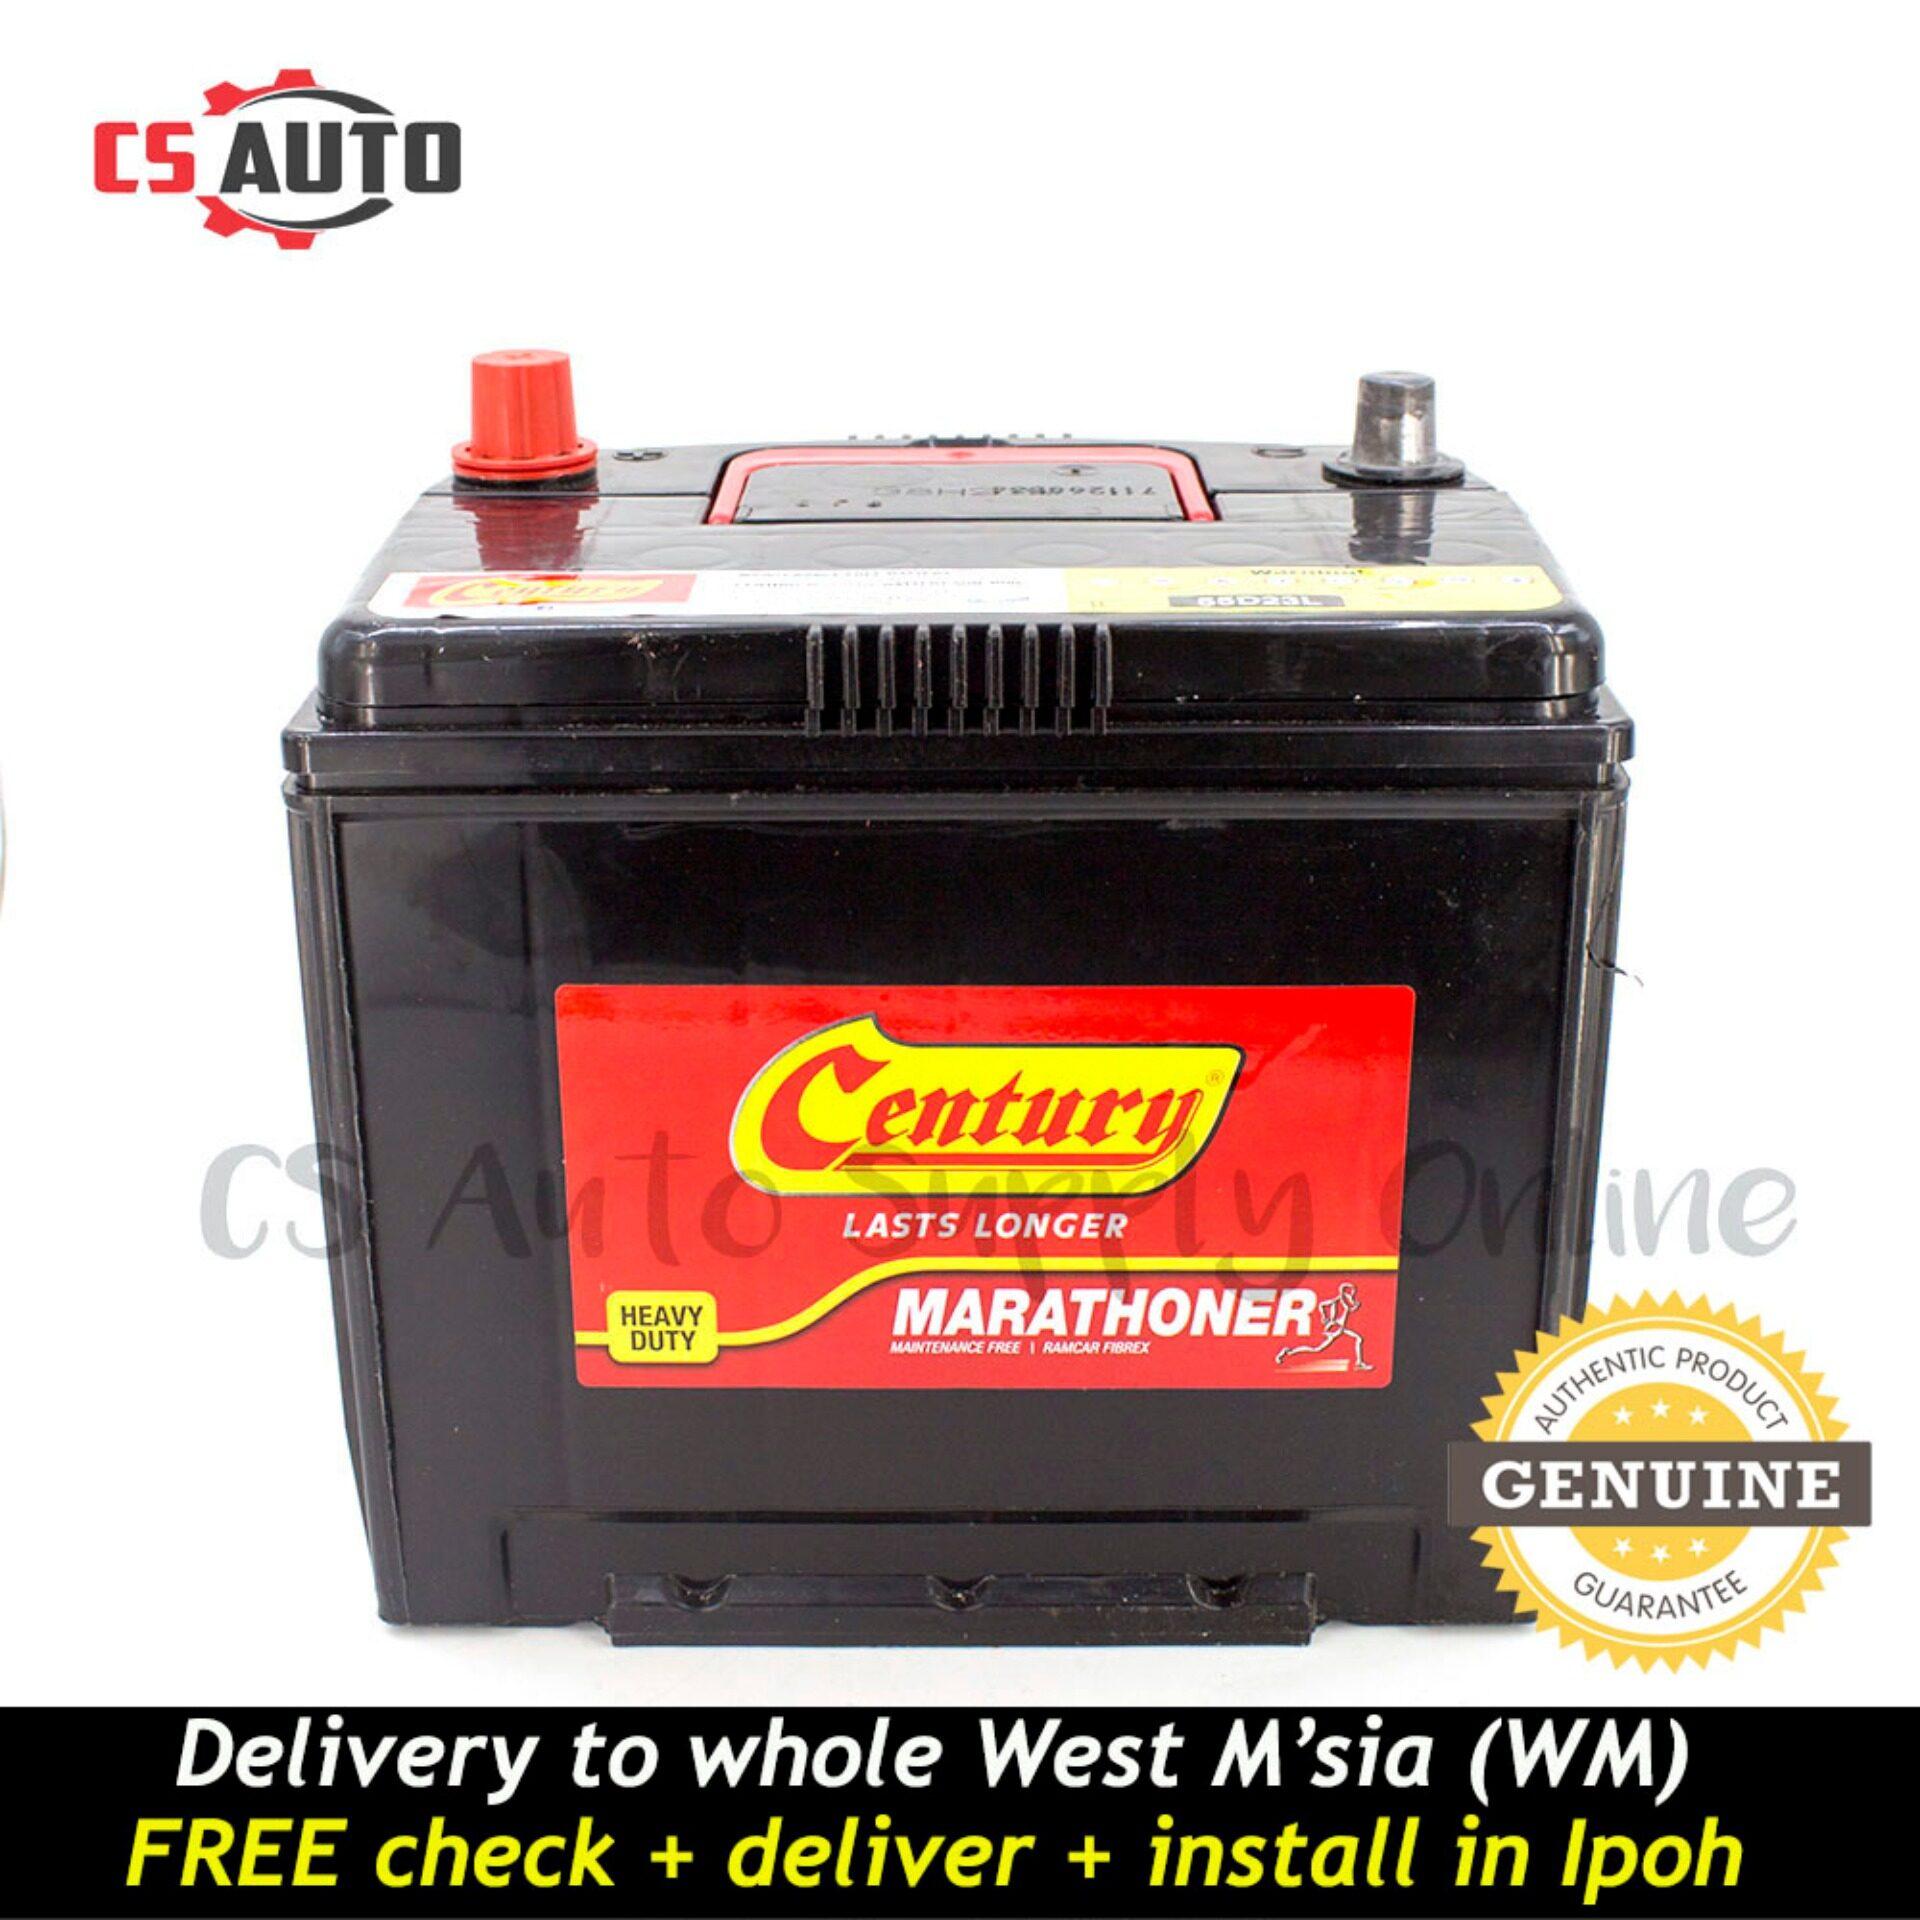 Century 55D23L 55D23 Marathoner Car Battery MF for Proton Preve, Toyota Camry, Vellfire and Mazda Ipoh (100% Original)